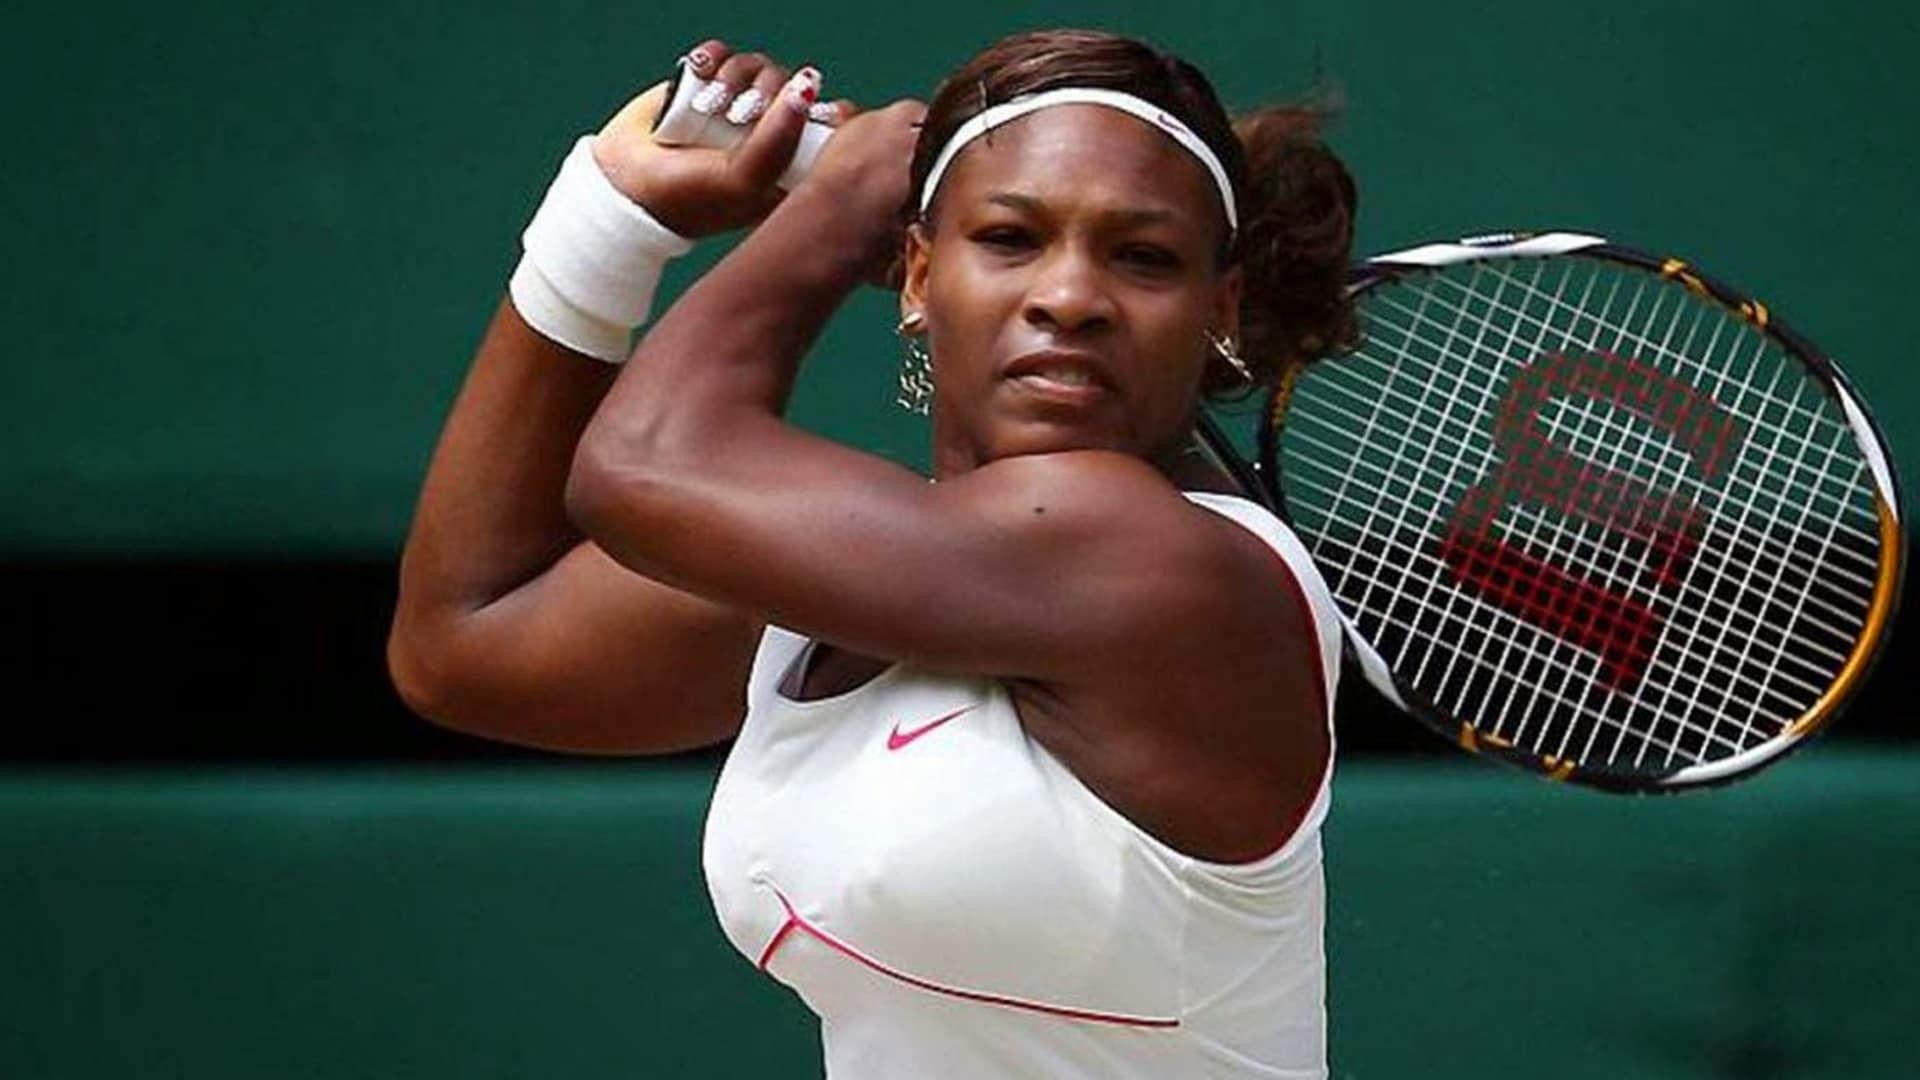 Serena Williams images Serena Williams Wallpaper 2018 HD wallpaper 1920x1080